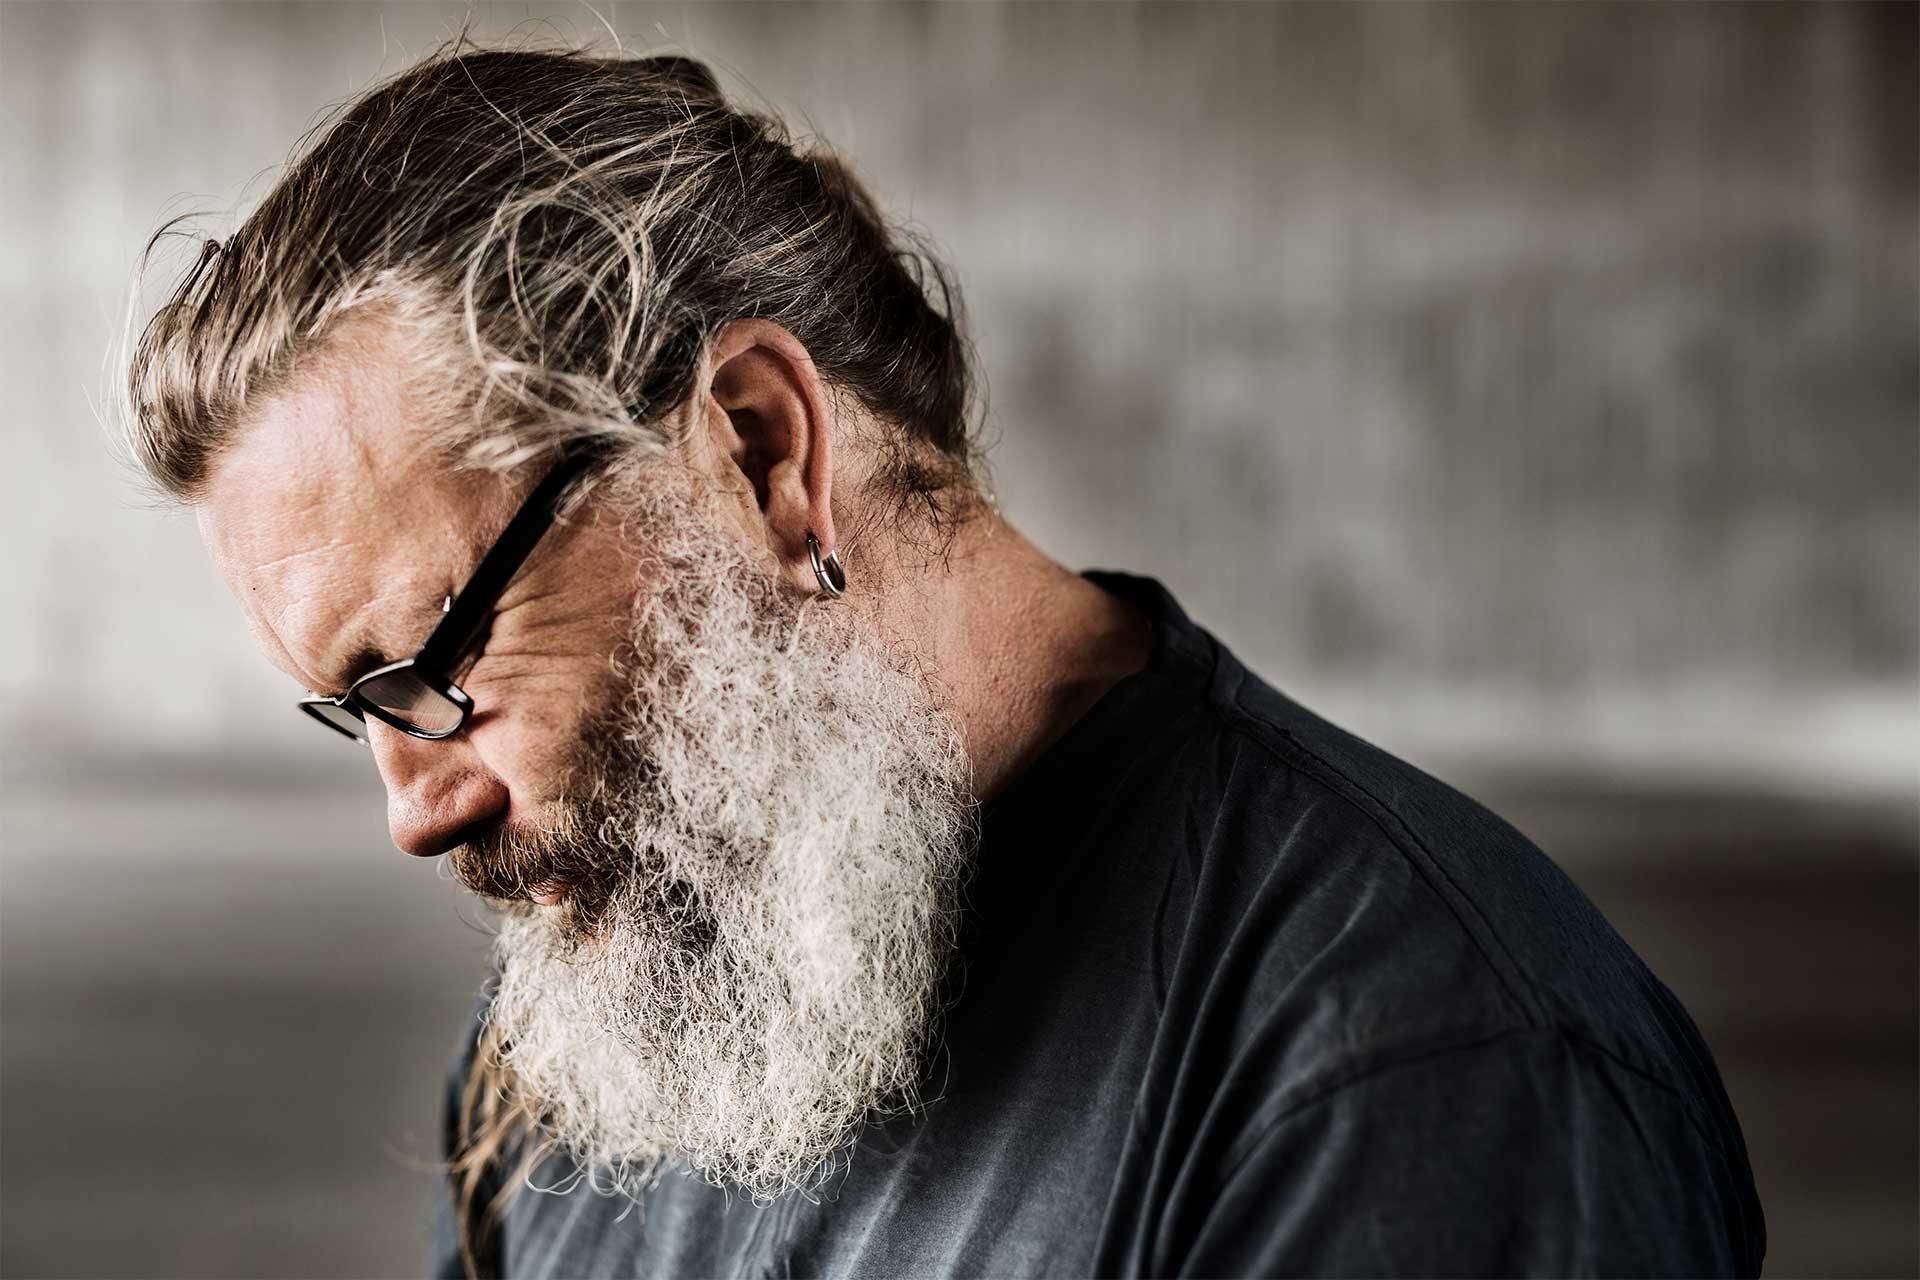 portrait-of-mature-man-with-beard-JAVJHV8.jpg